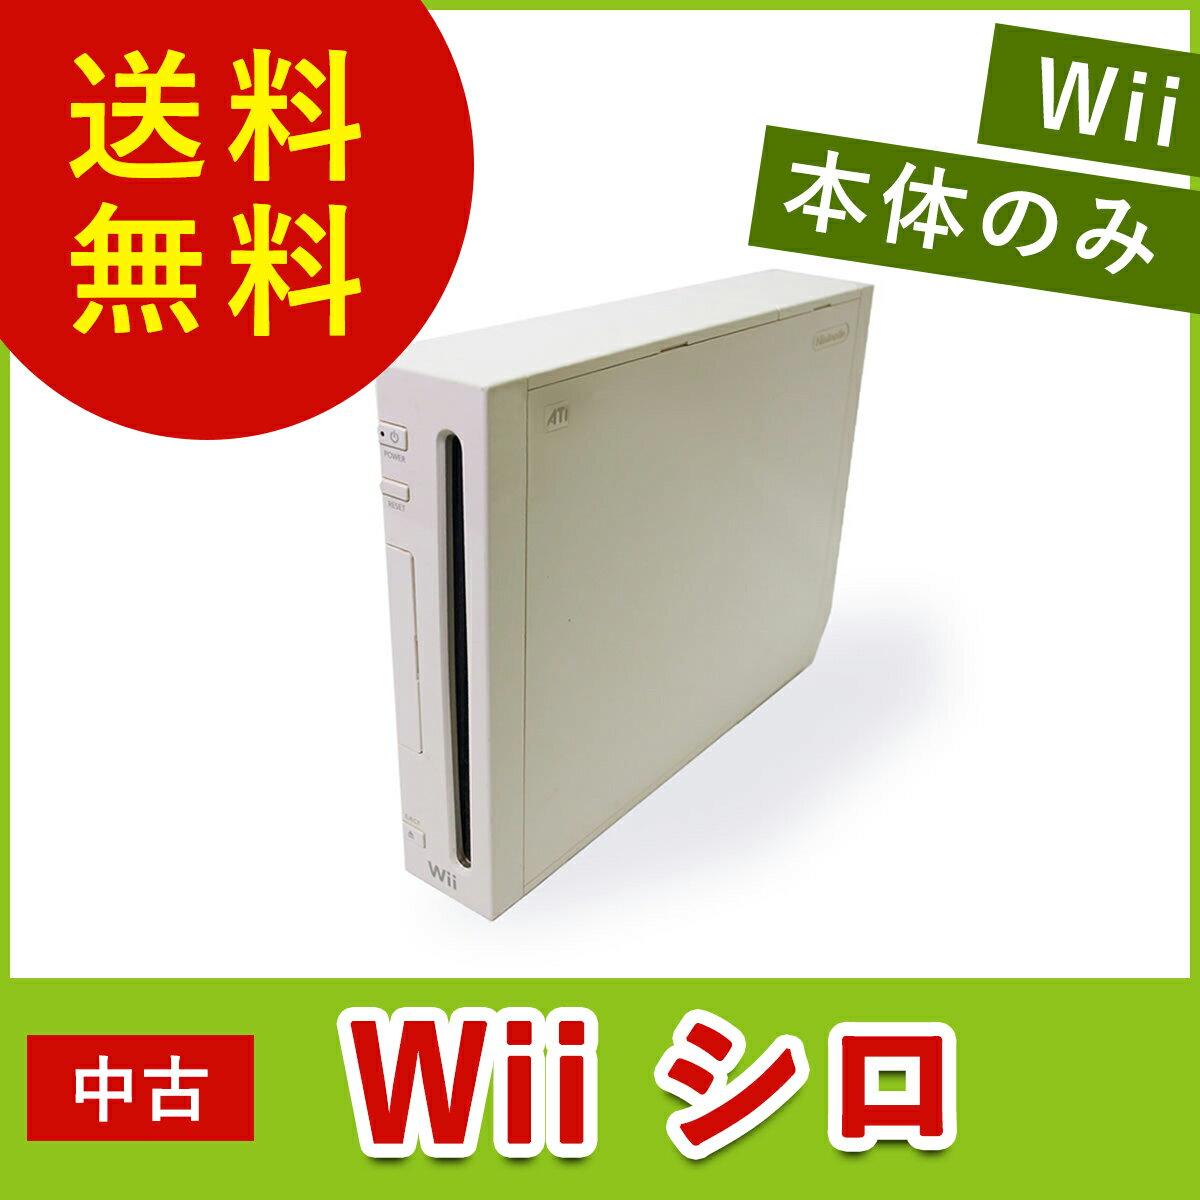 Wii ウィー ニンテンドーWii 本体 中古 シロ 白 Nintendo 任天堂 ニンテンドー 4902370516227 送料無料 【中古】